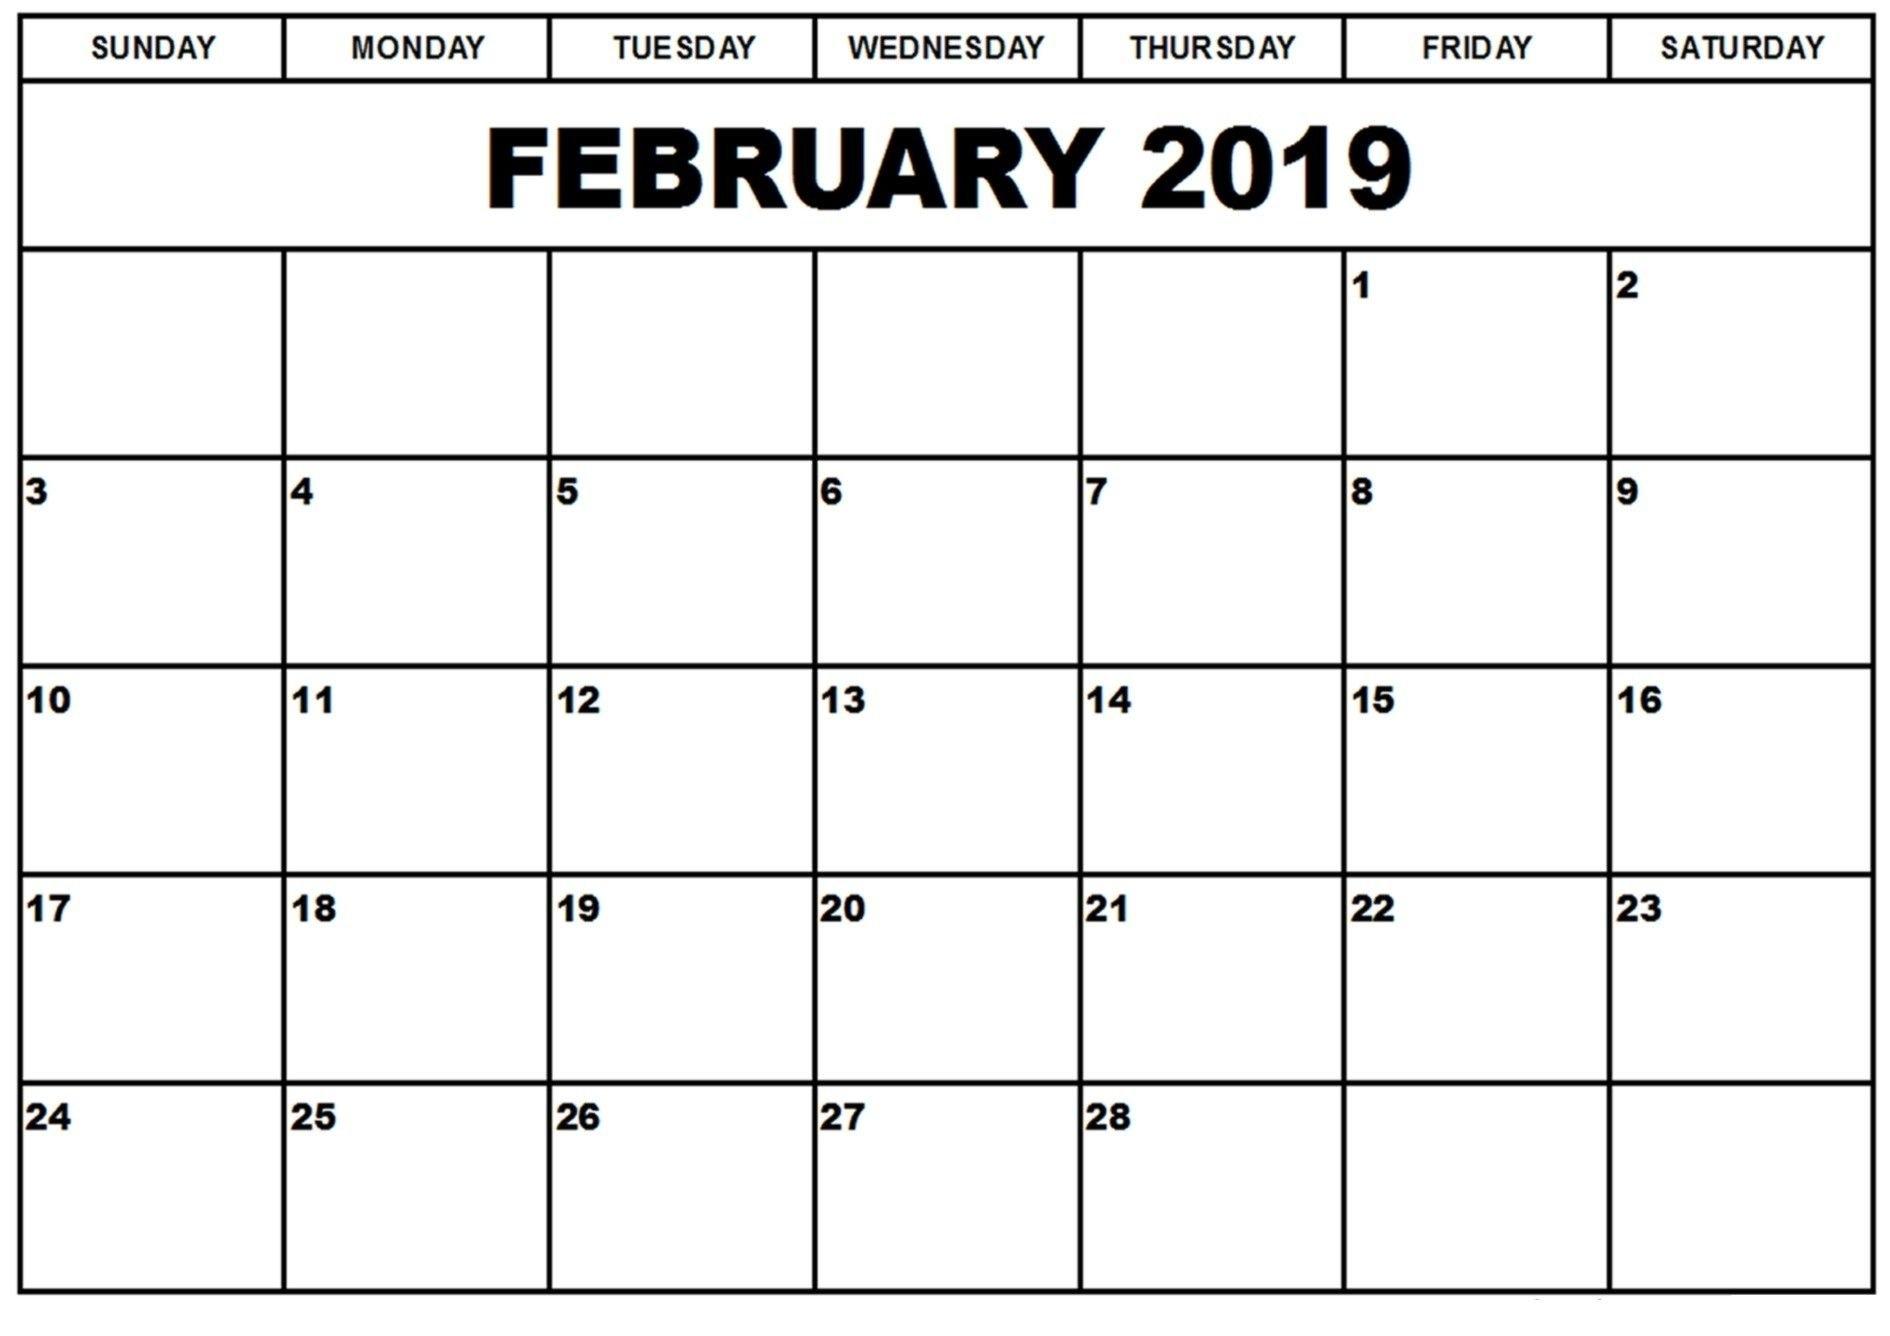 Printable Calendars Save February 2019 Calendar Printable Templates Calendar 2019 Fillable